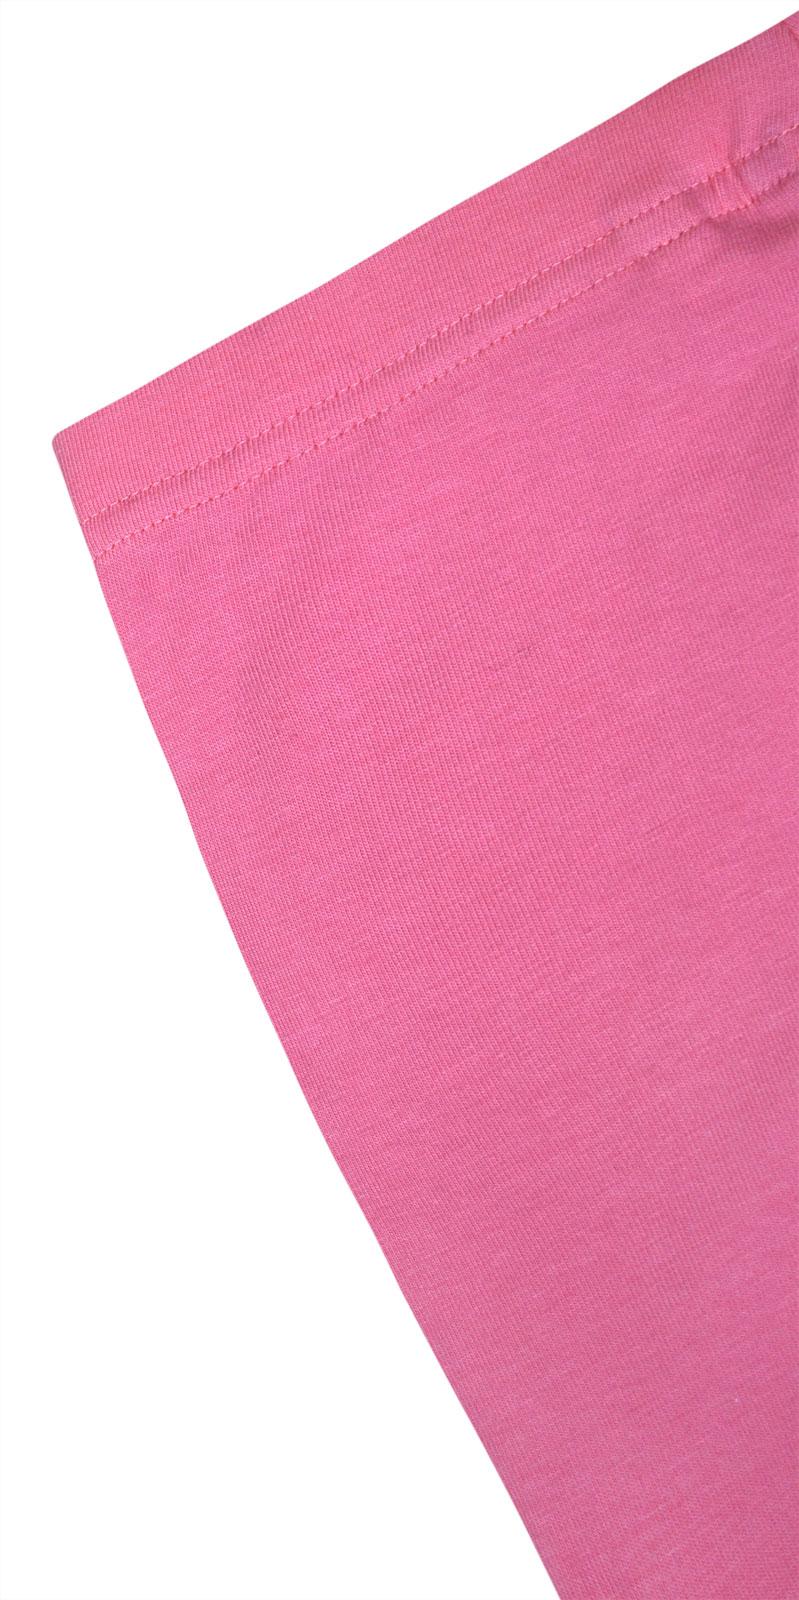 Girls-Next-Leggings-Kids-New-Pants-Age-2-3-4-5-6-7-8-9-10-11-12-13-14-15-16-Yrs thumbnail 9